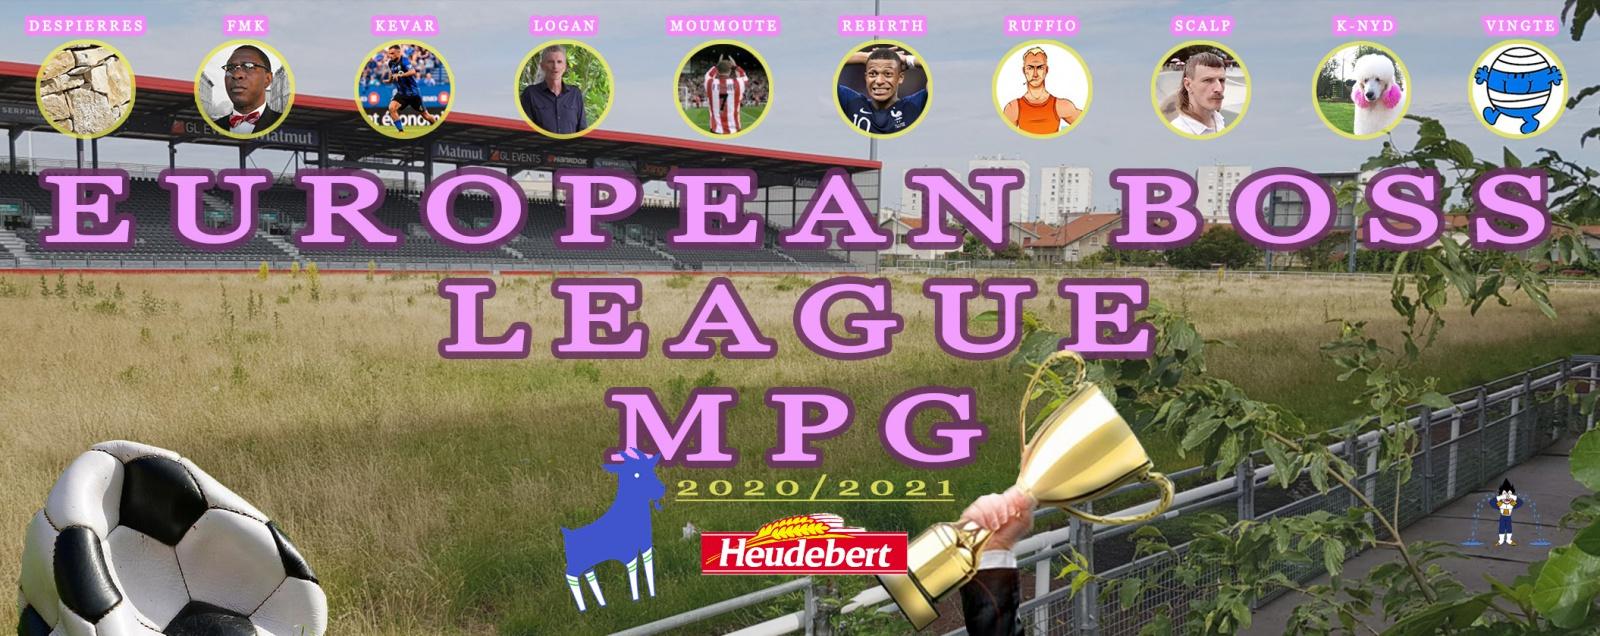 European-Boss-League-2.thumb.jpg.74635fc45e04c63dc7cccd51b866fba2.jpg